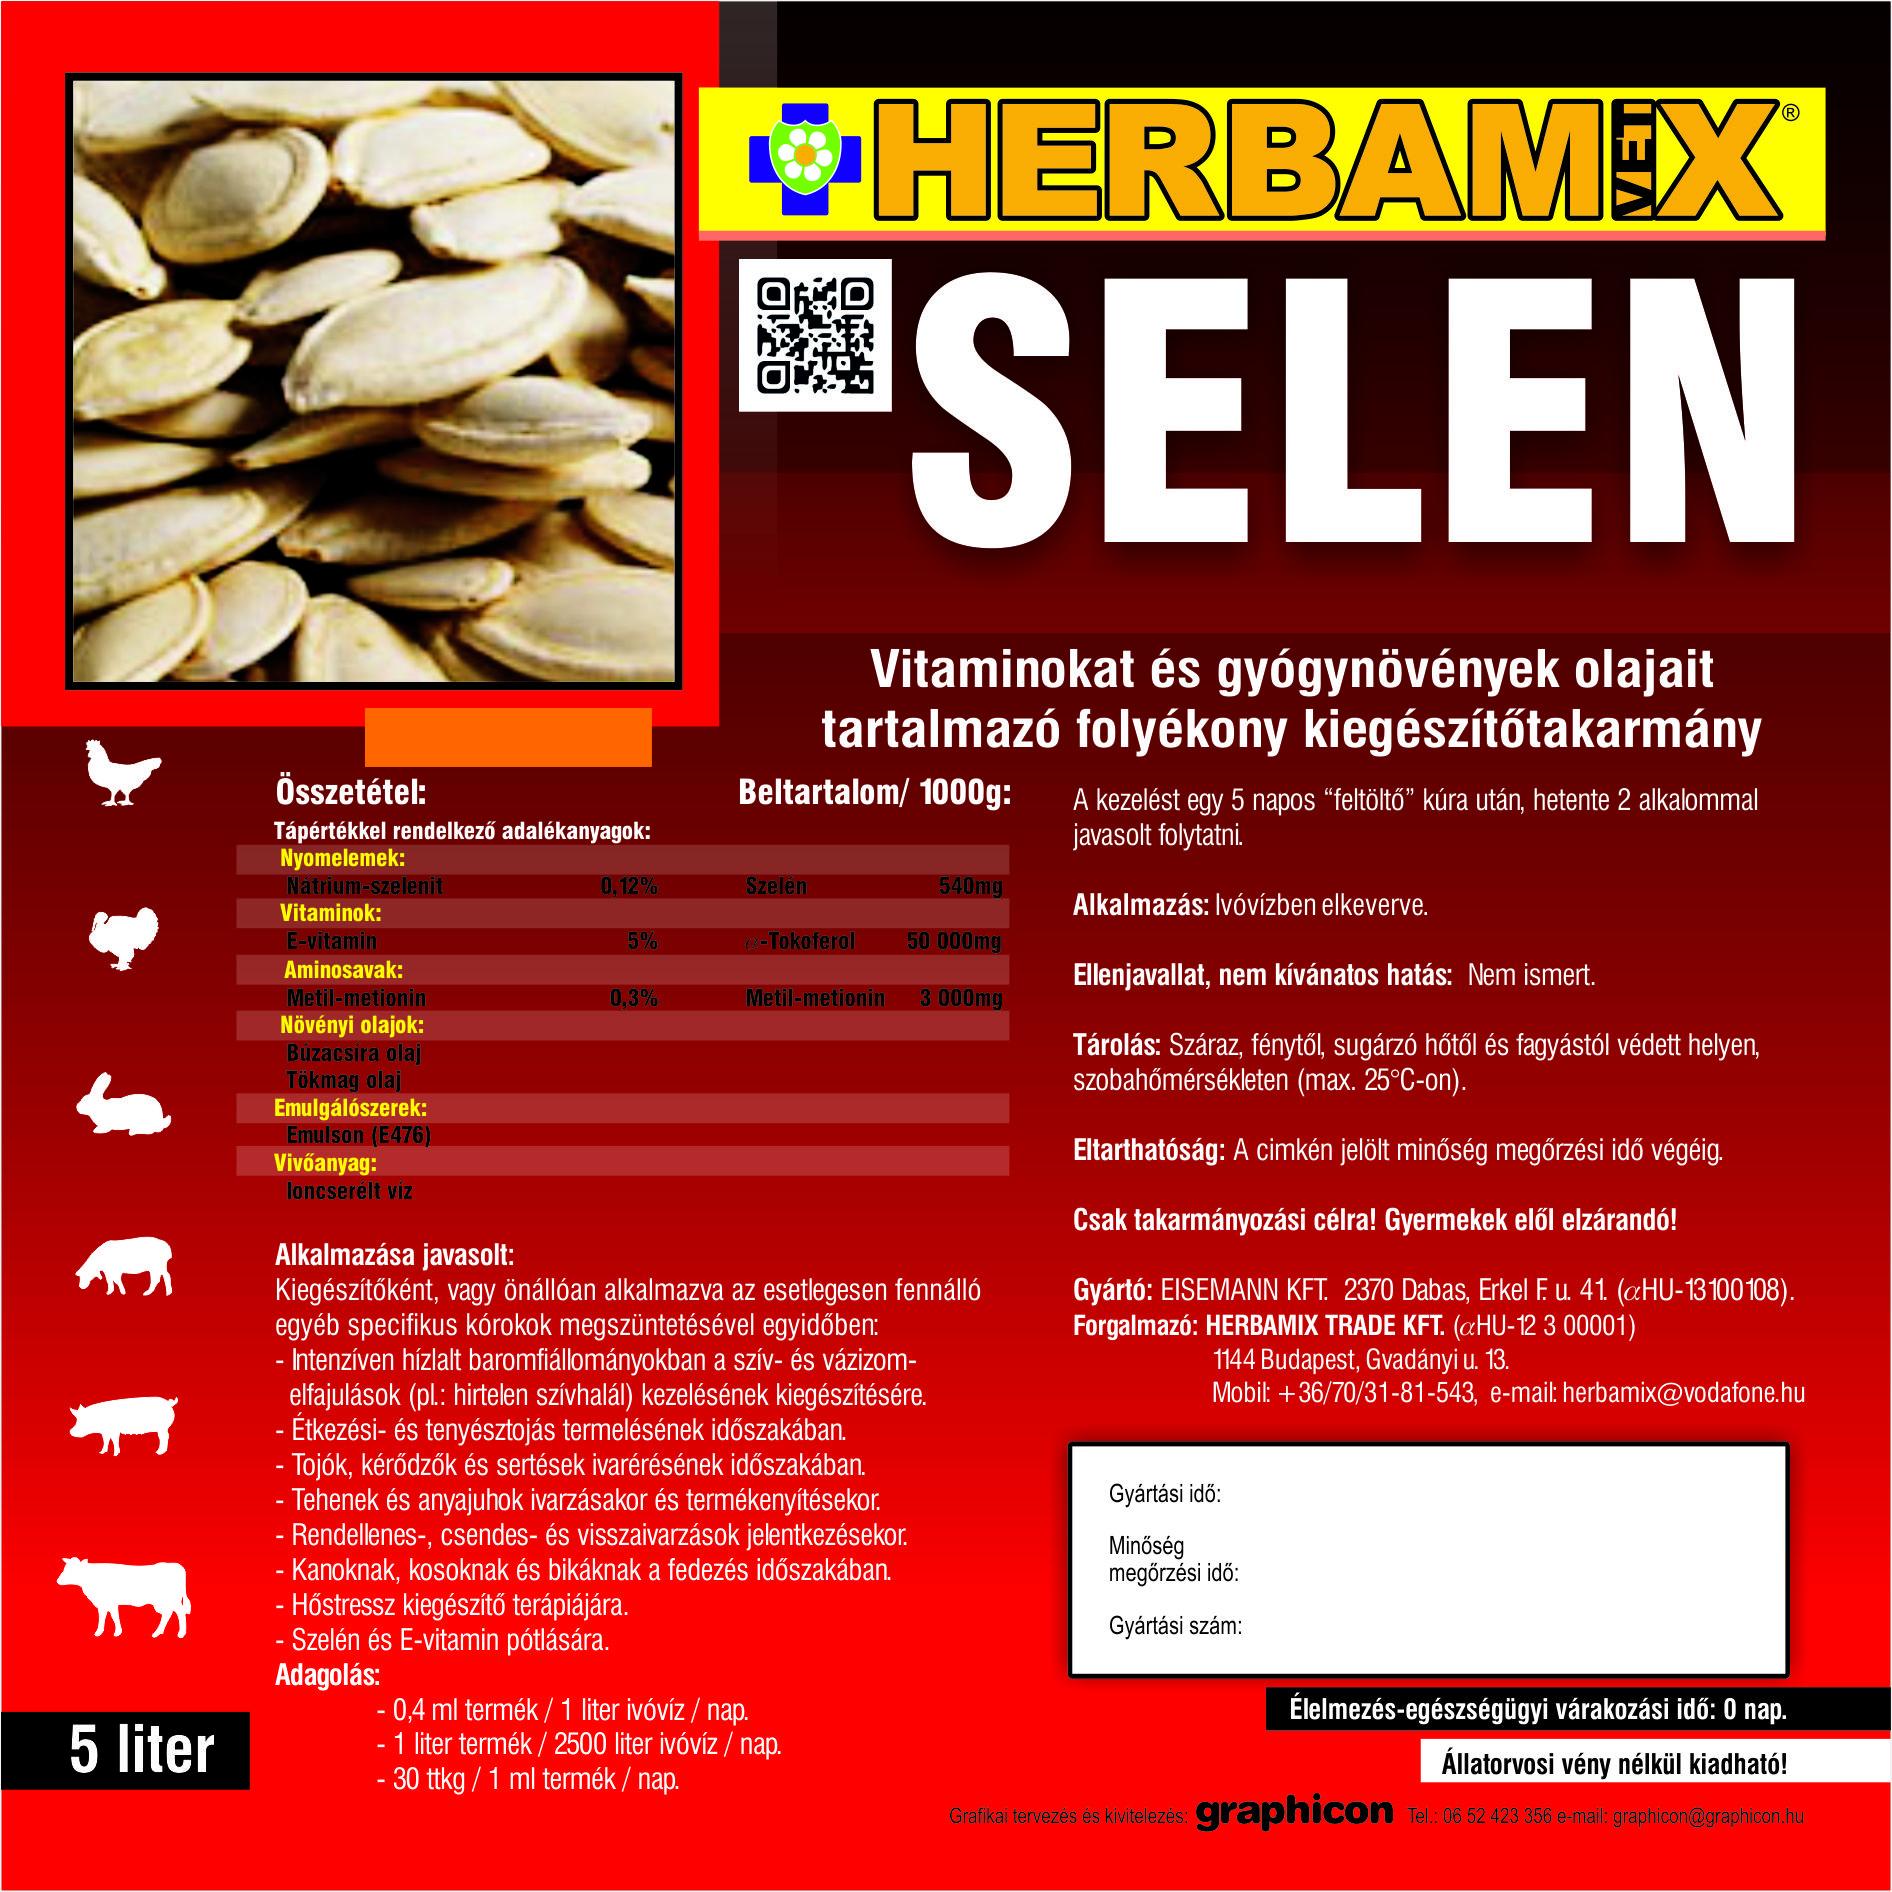 Herbamix Selen